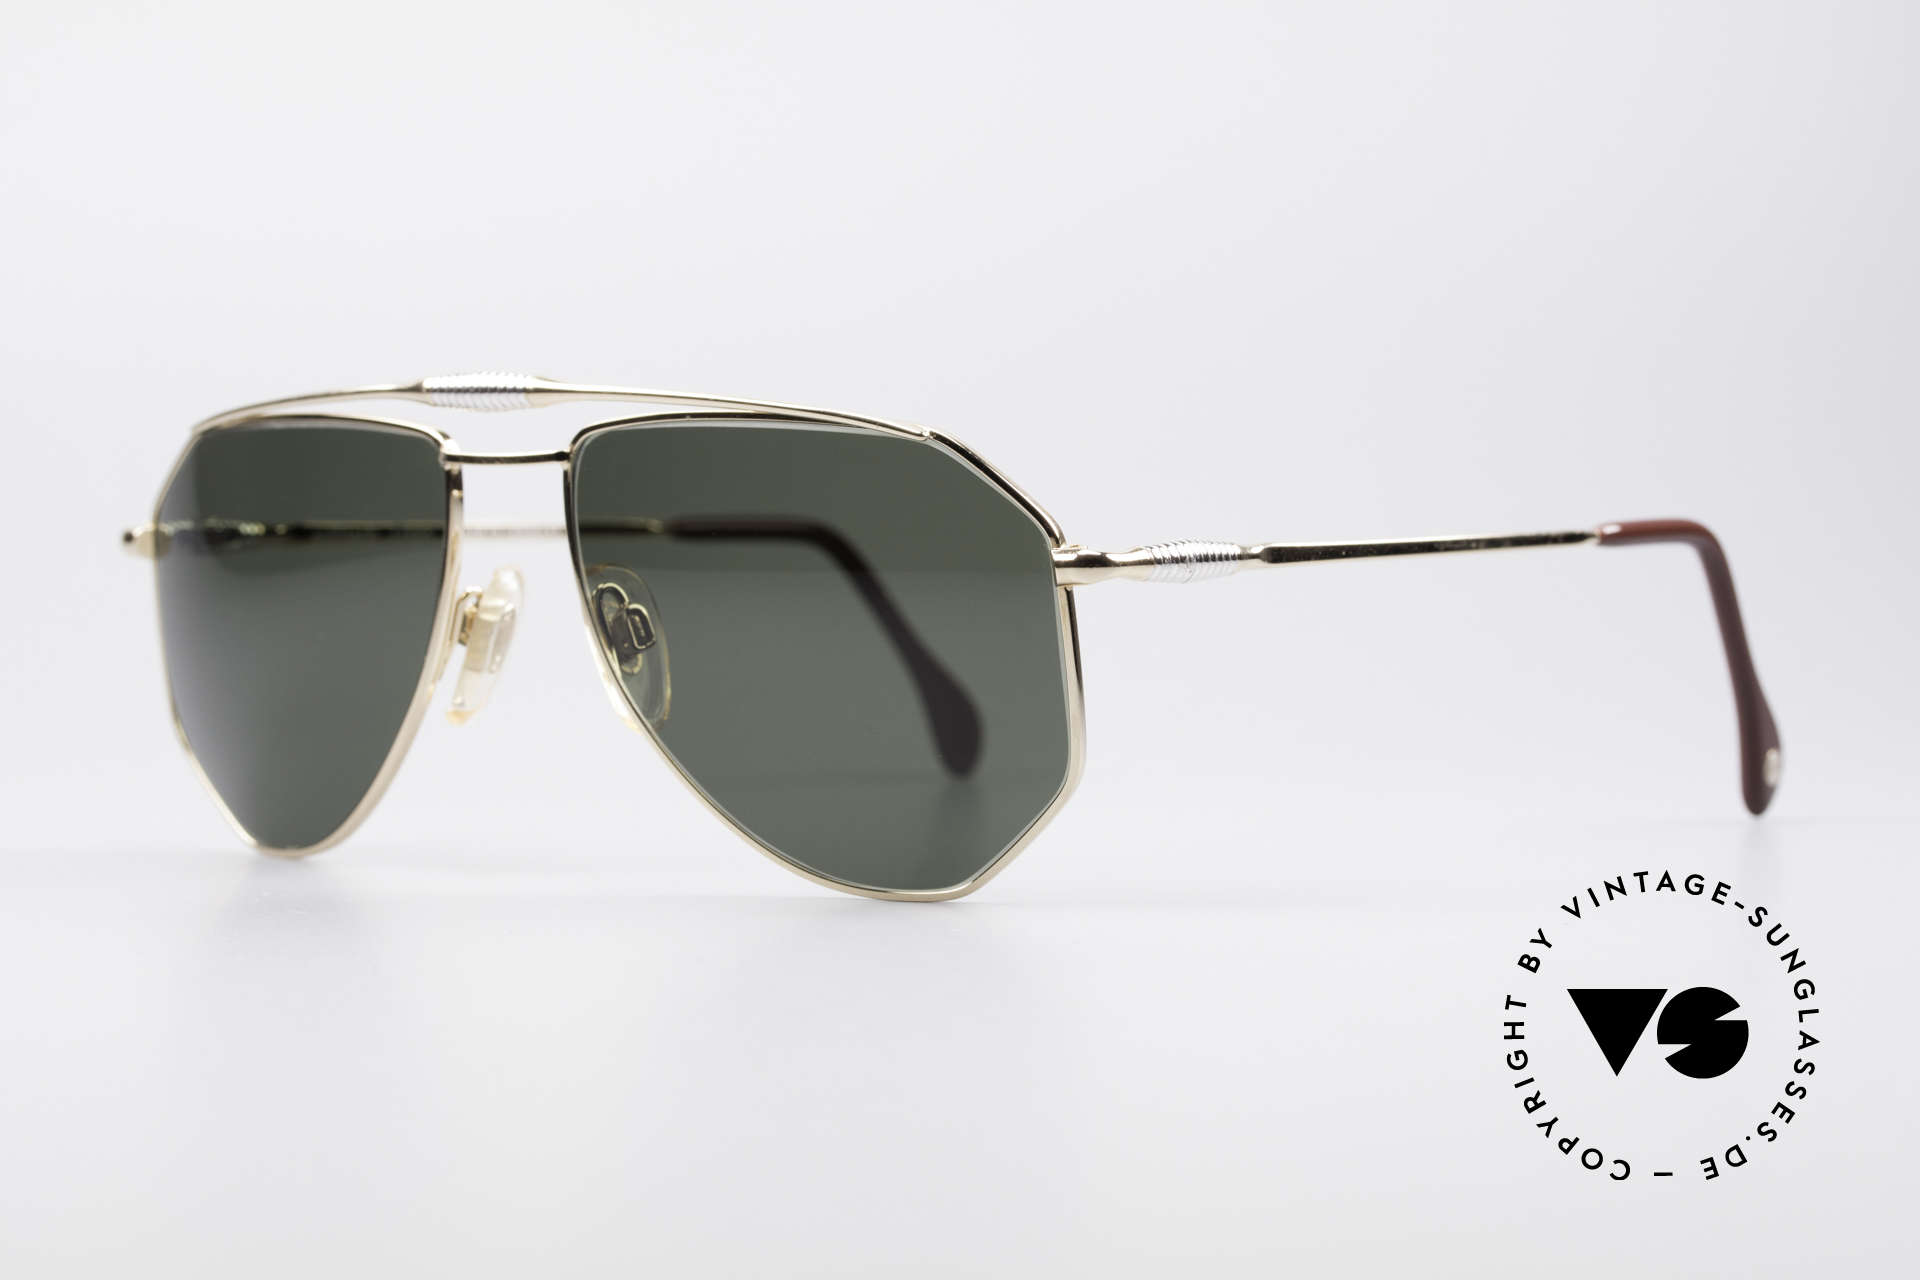 Zollitsch Cadre 120 Medium 80's Aviator Glasses, an interesting alternative to the ordinary 'aviator style', Made for Men